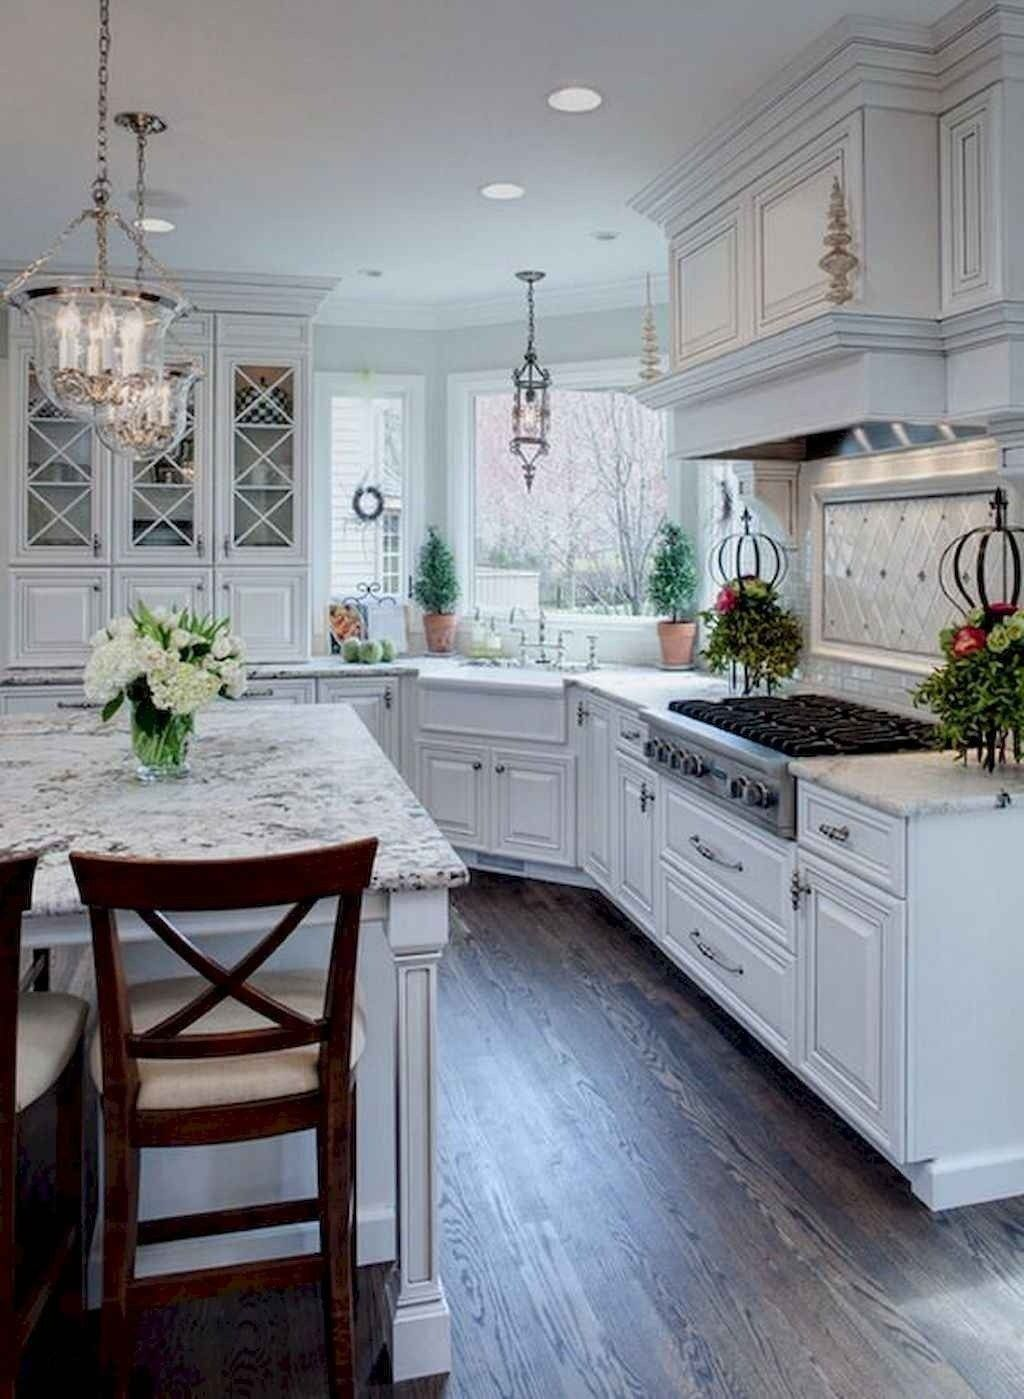 100 Elegant White Kitchen Cabinets Decor Ideas For Farmhouse Style Design 27 farmhouse #100 #elegant #white #kitchen #cabinets #decor #ideas #for #farmhouse #style #design #27